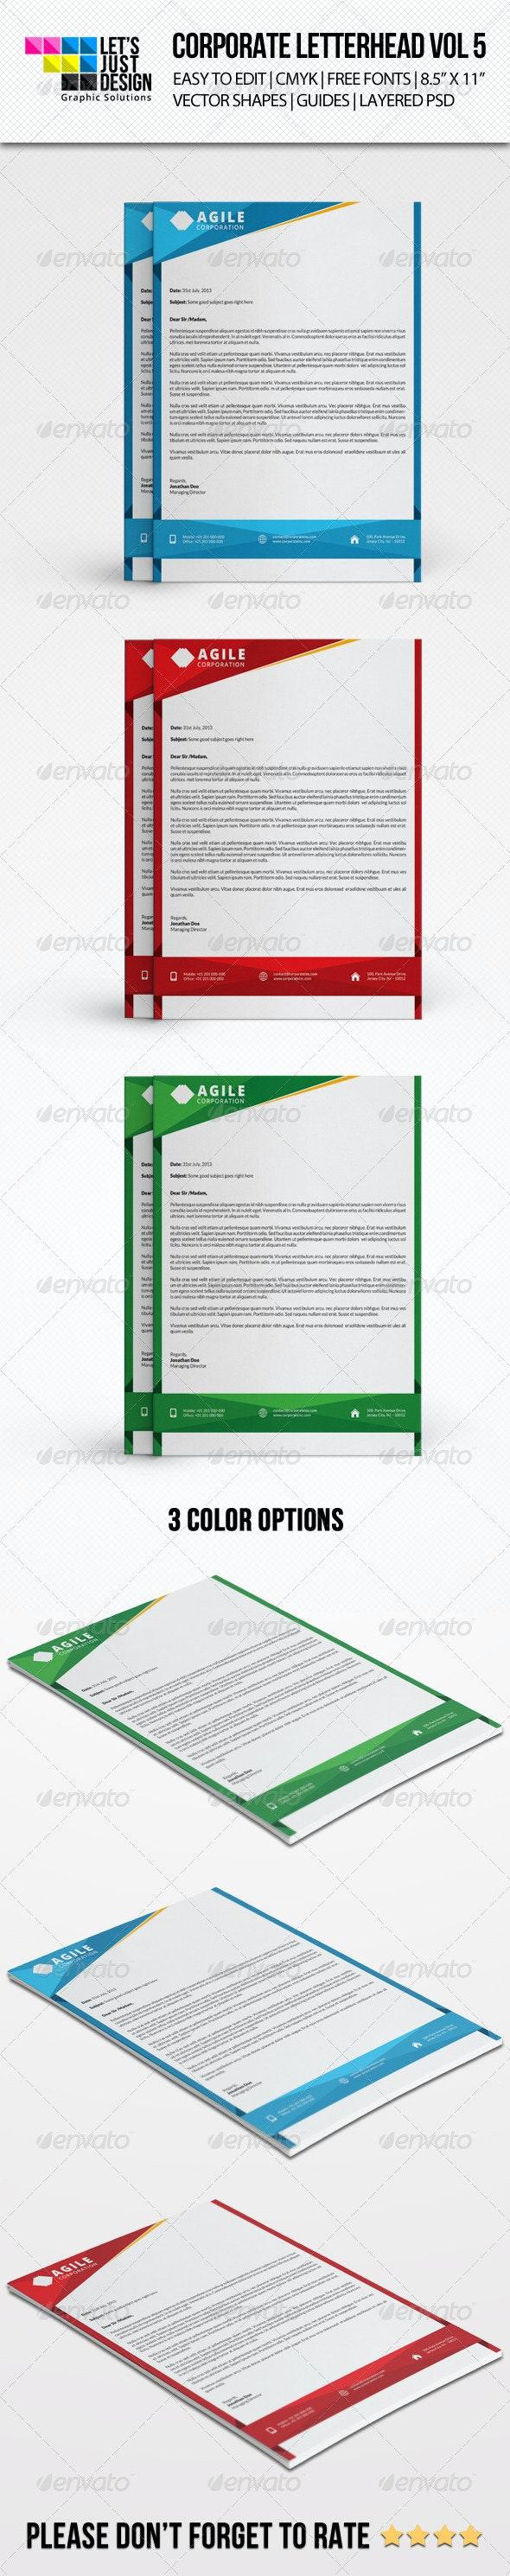 Corporate Letterhead Vol 5 - Stationery Print Templates